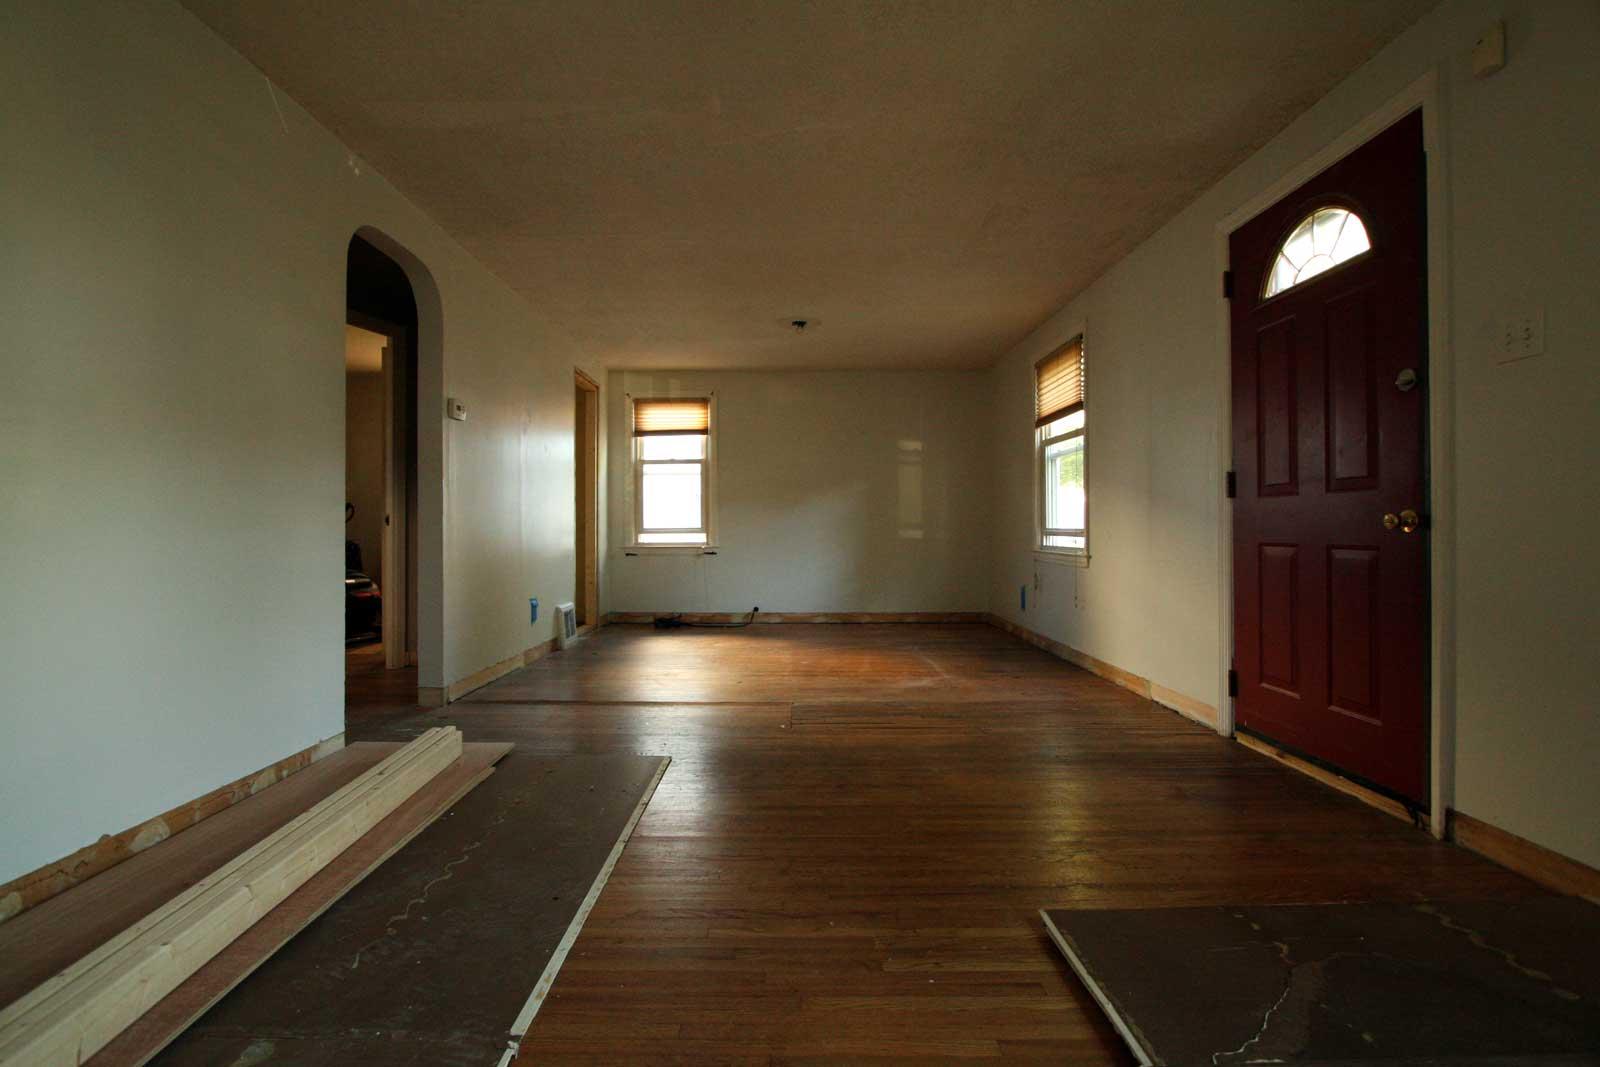 Infilled wood floors